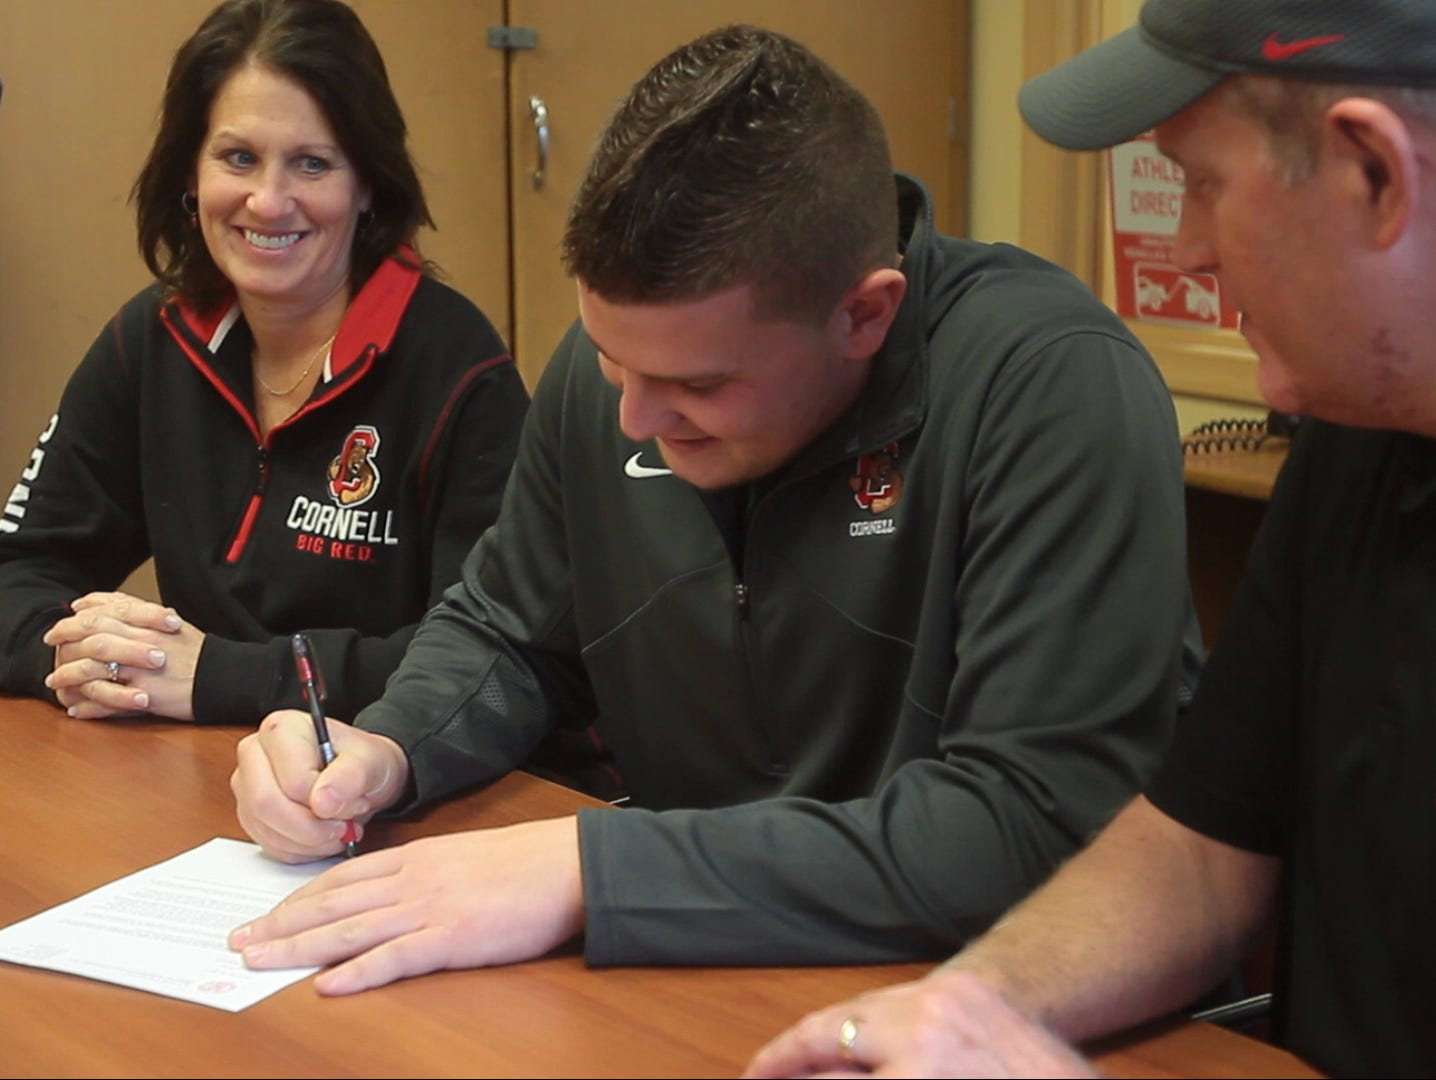 Jordan Landsman signed on to Cornell University on Feb. 3, 2016 at Nanuet Senior High School.